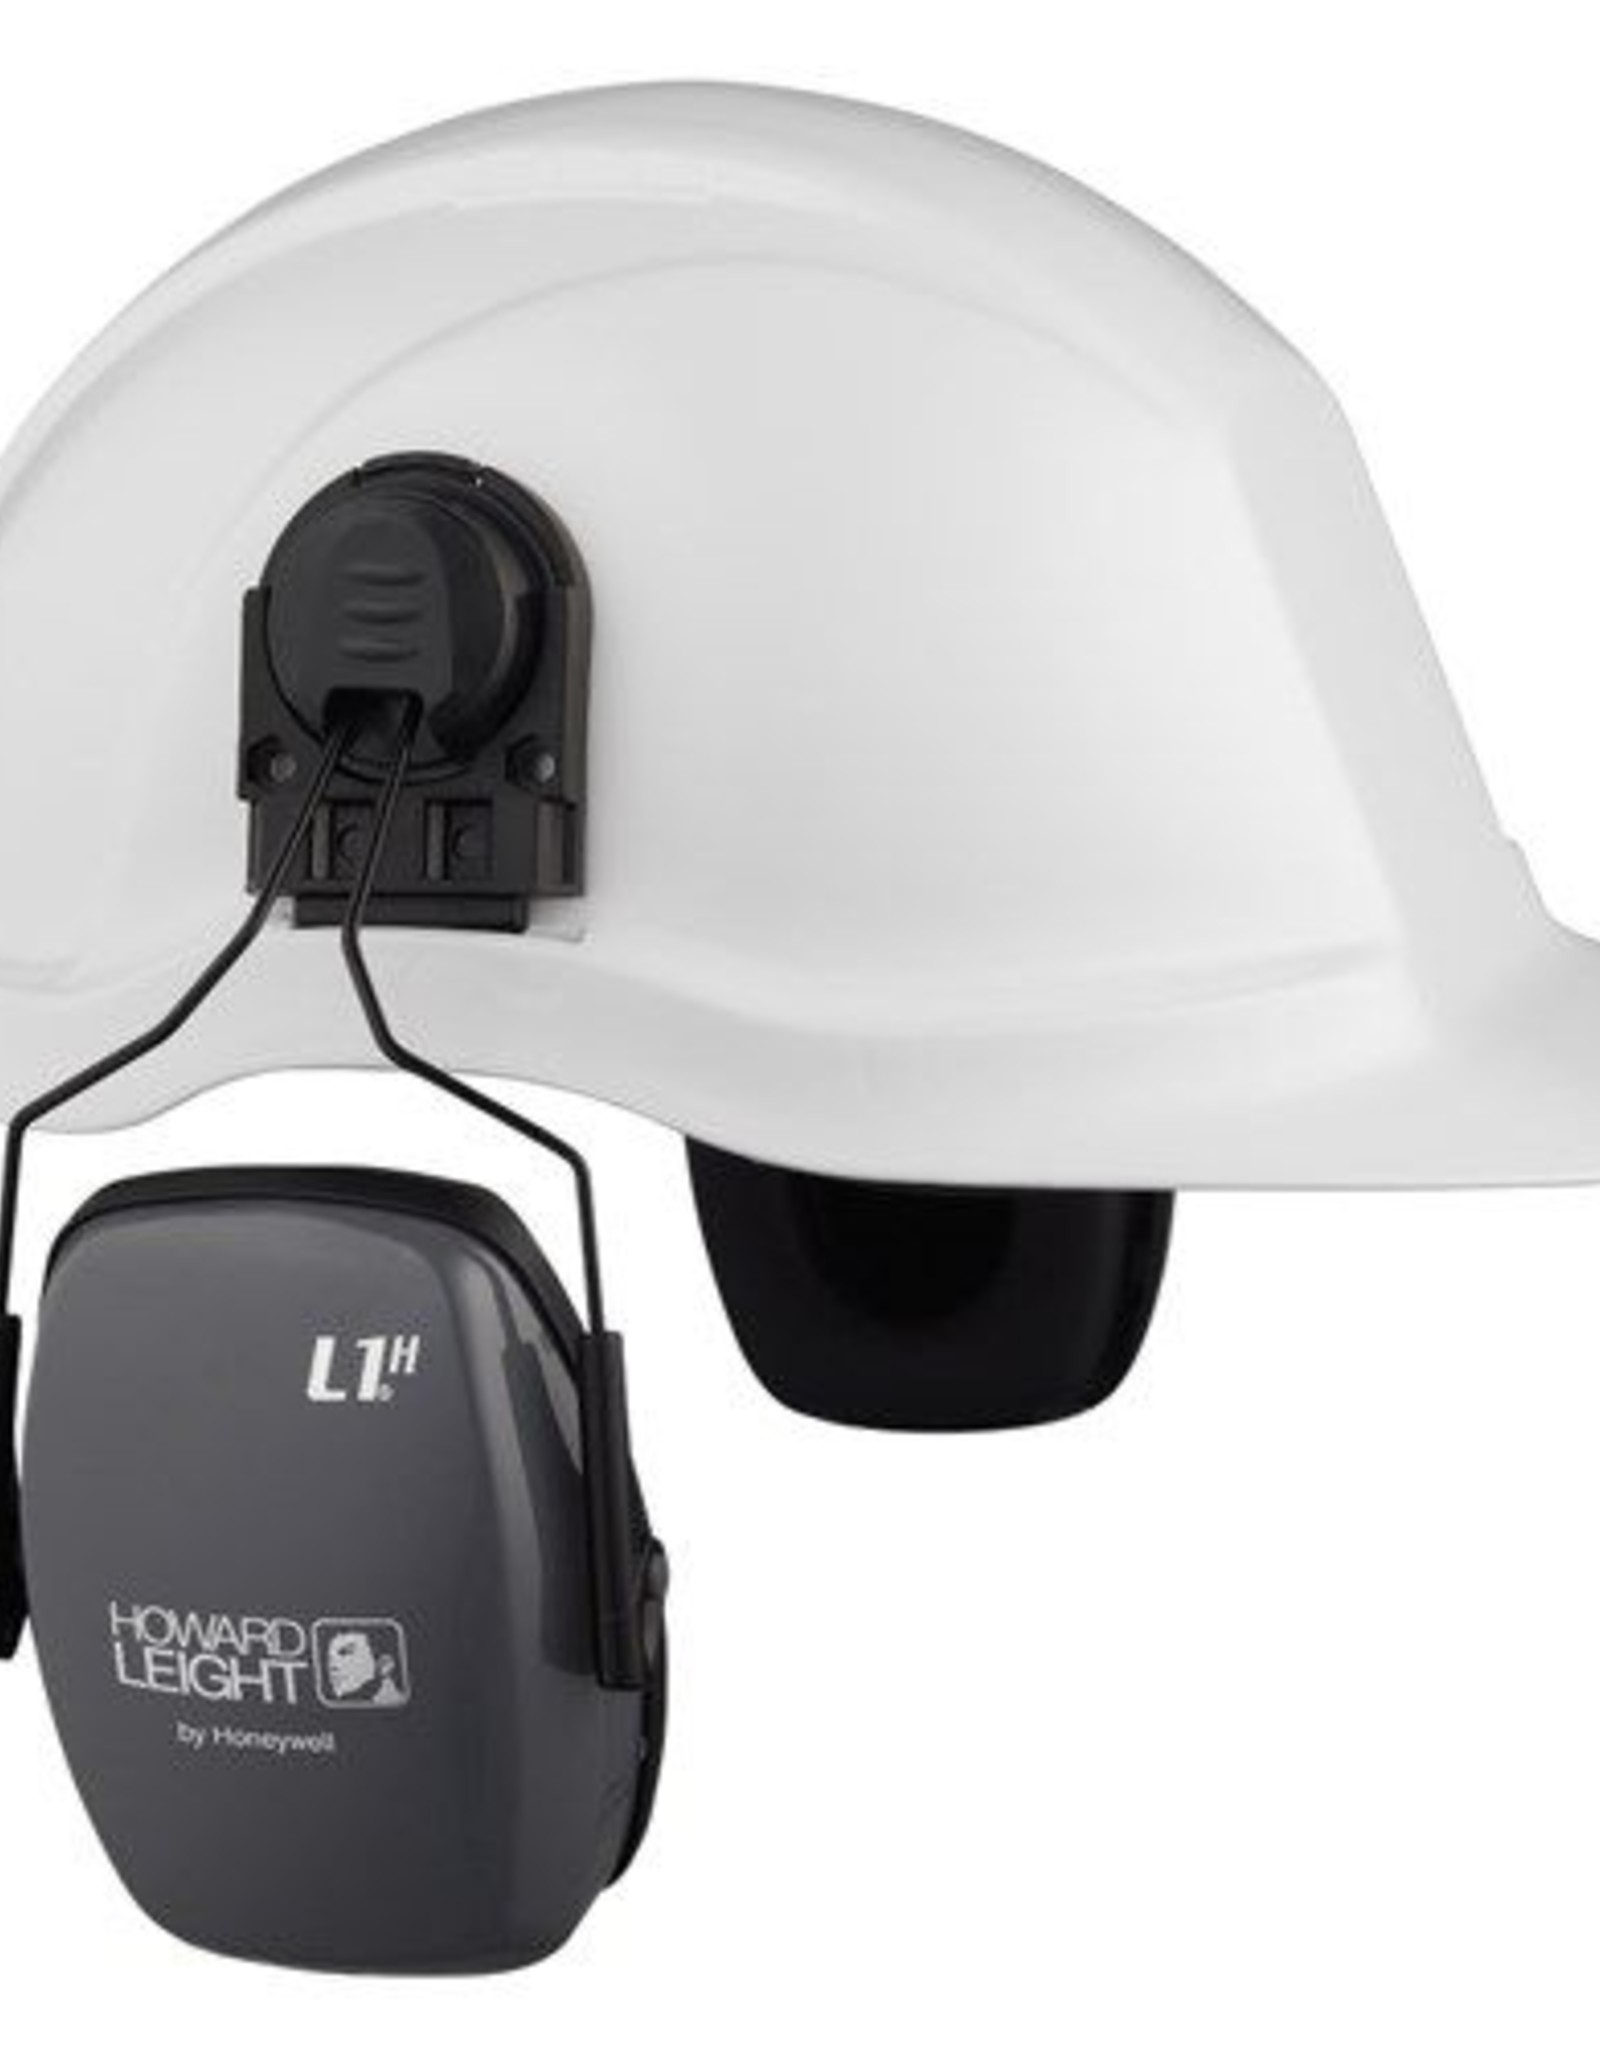 Howard Leight Howard Leight Leightning L1H Helmet Earmuff 28dB Class 5